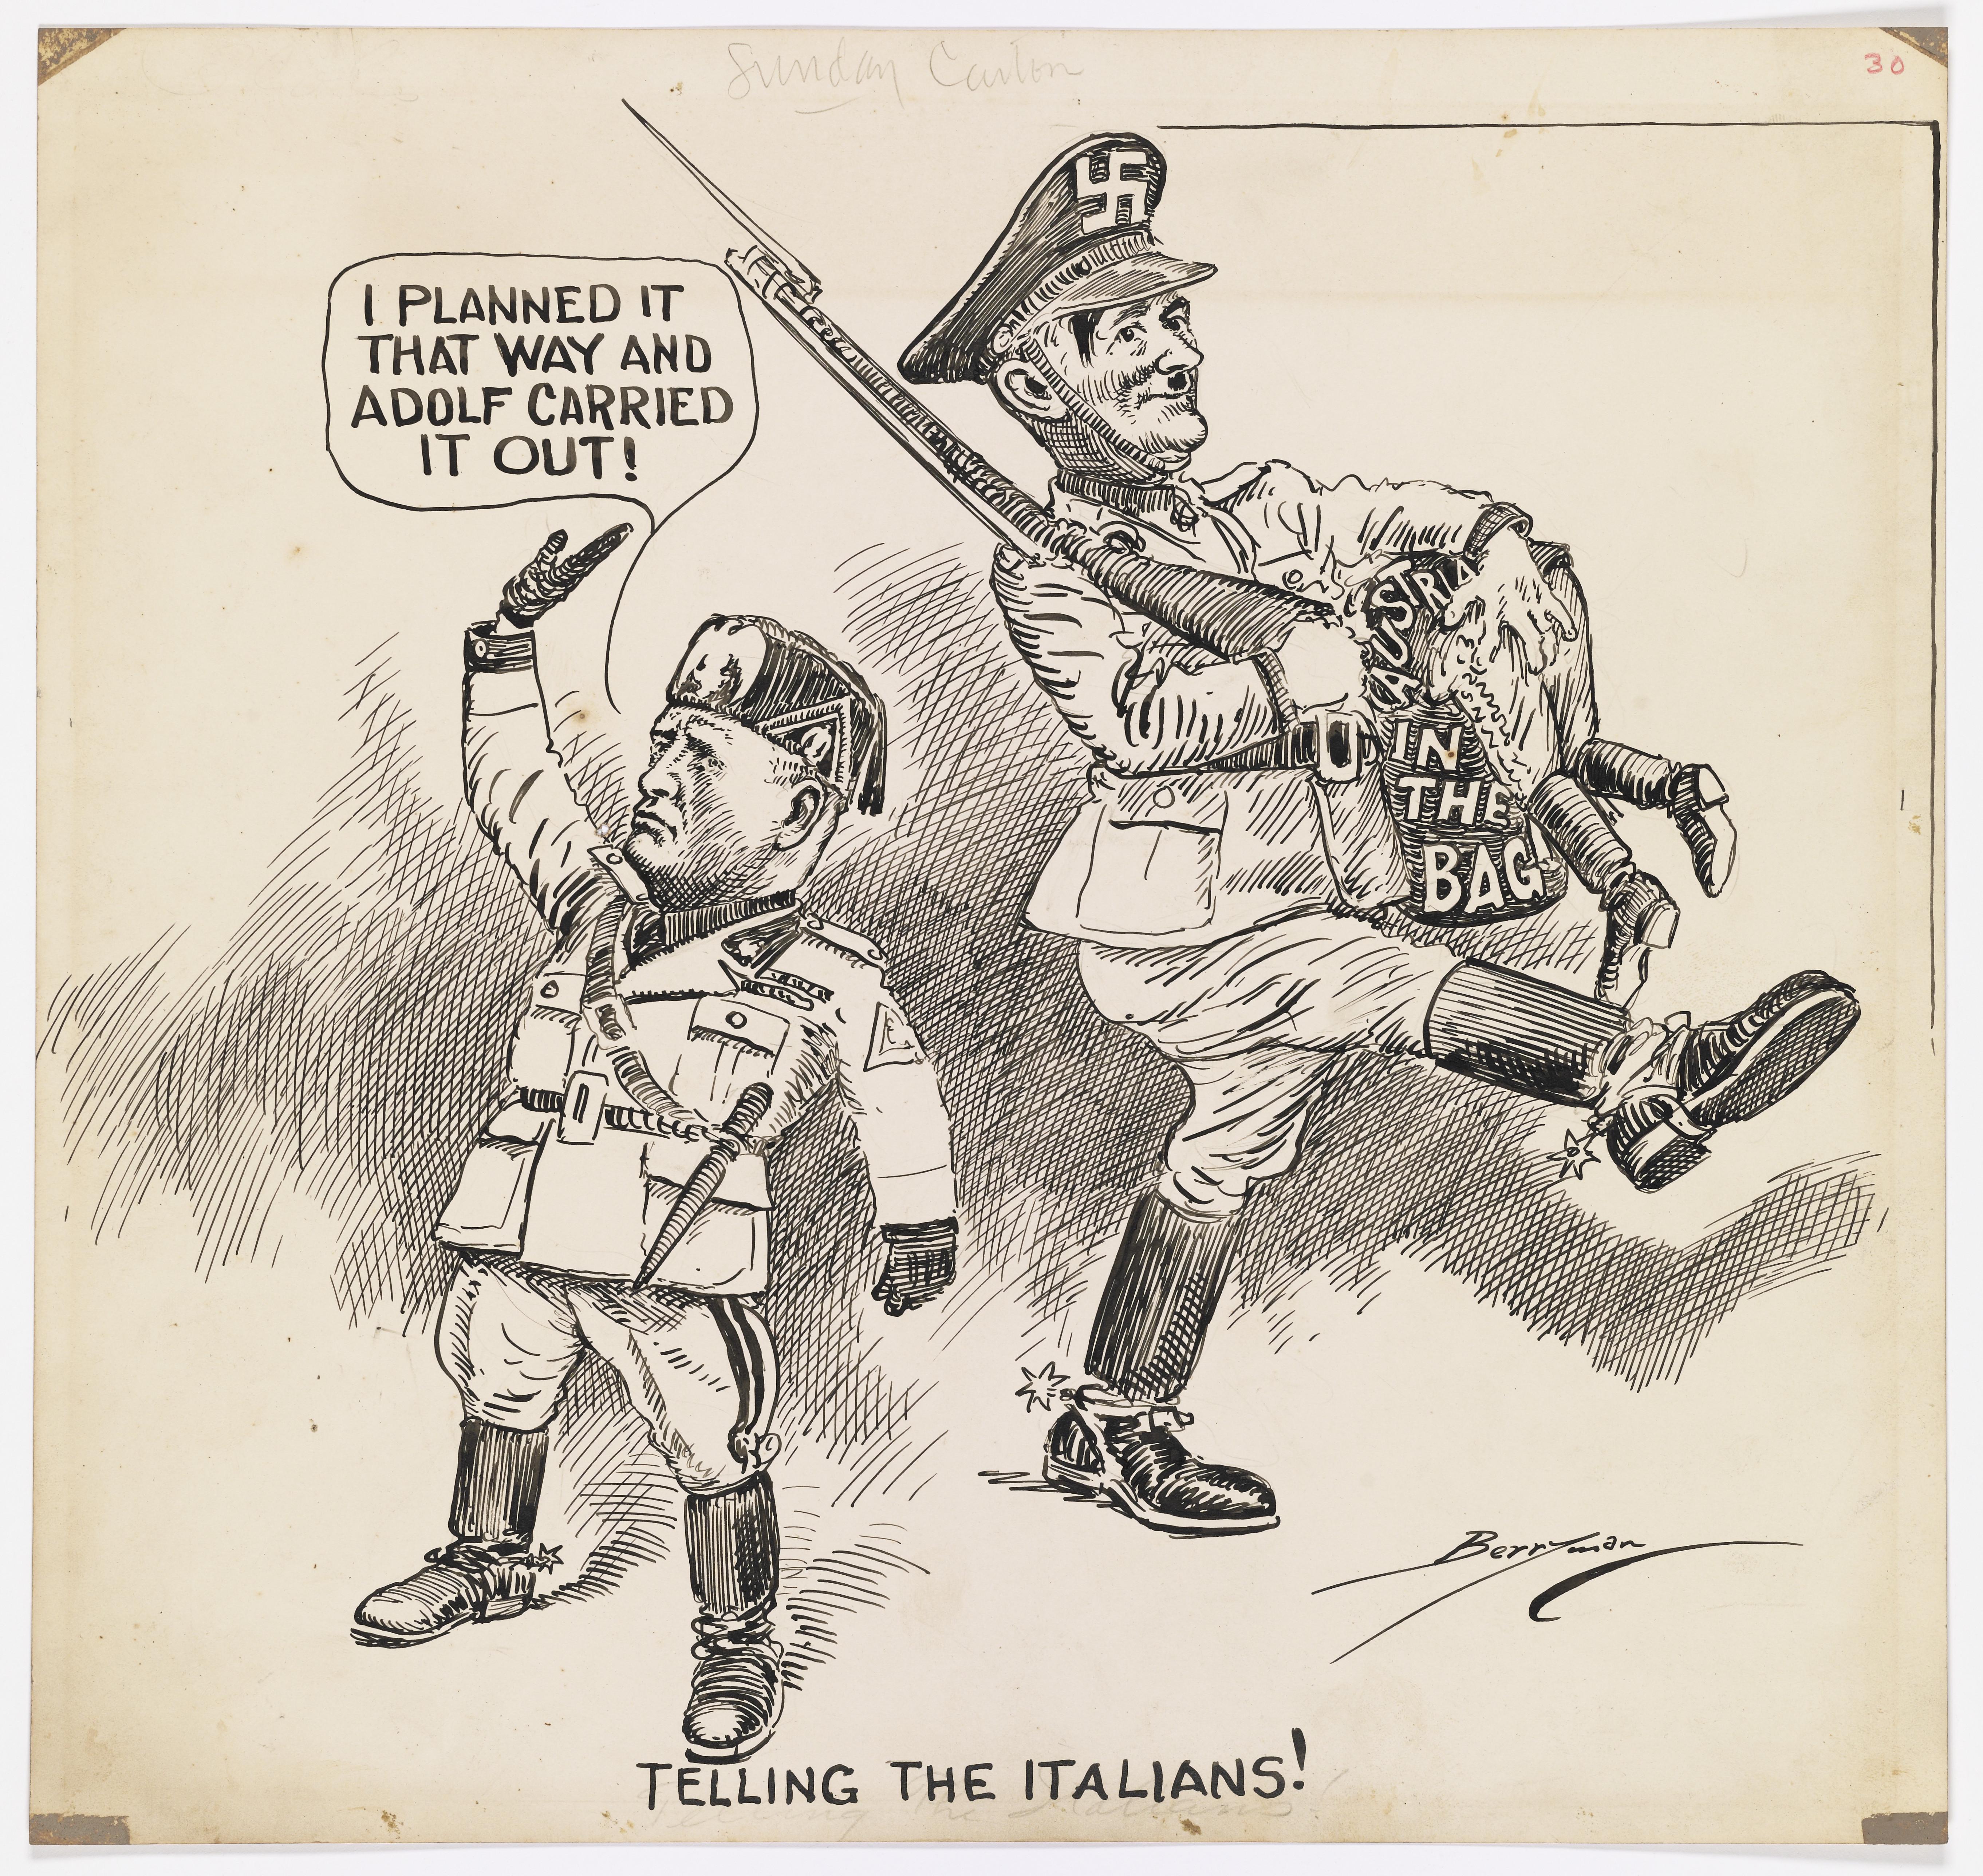 Telling the Italians!